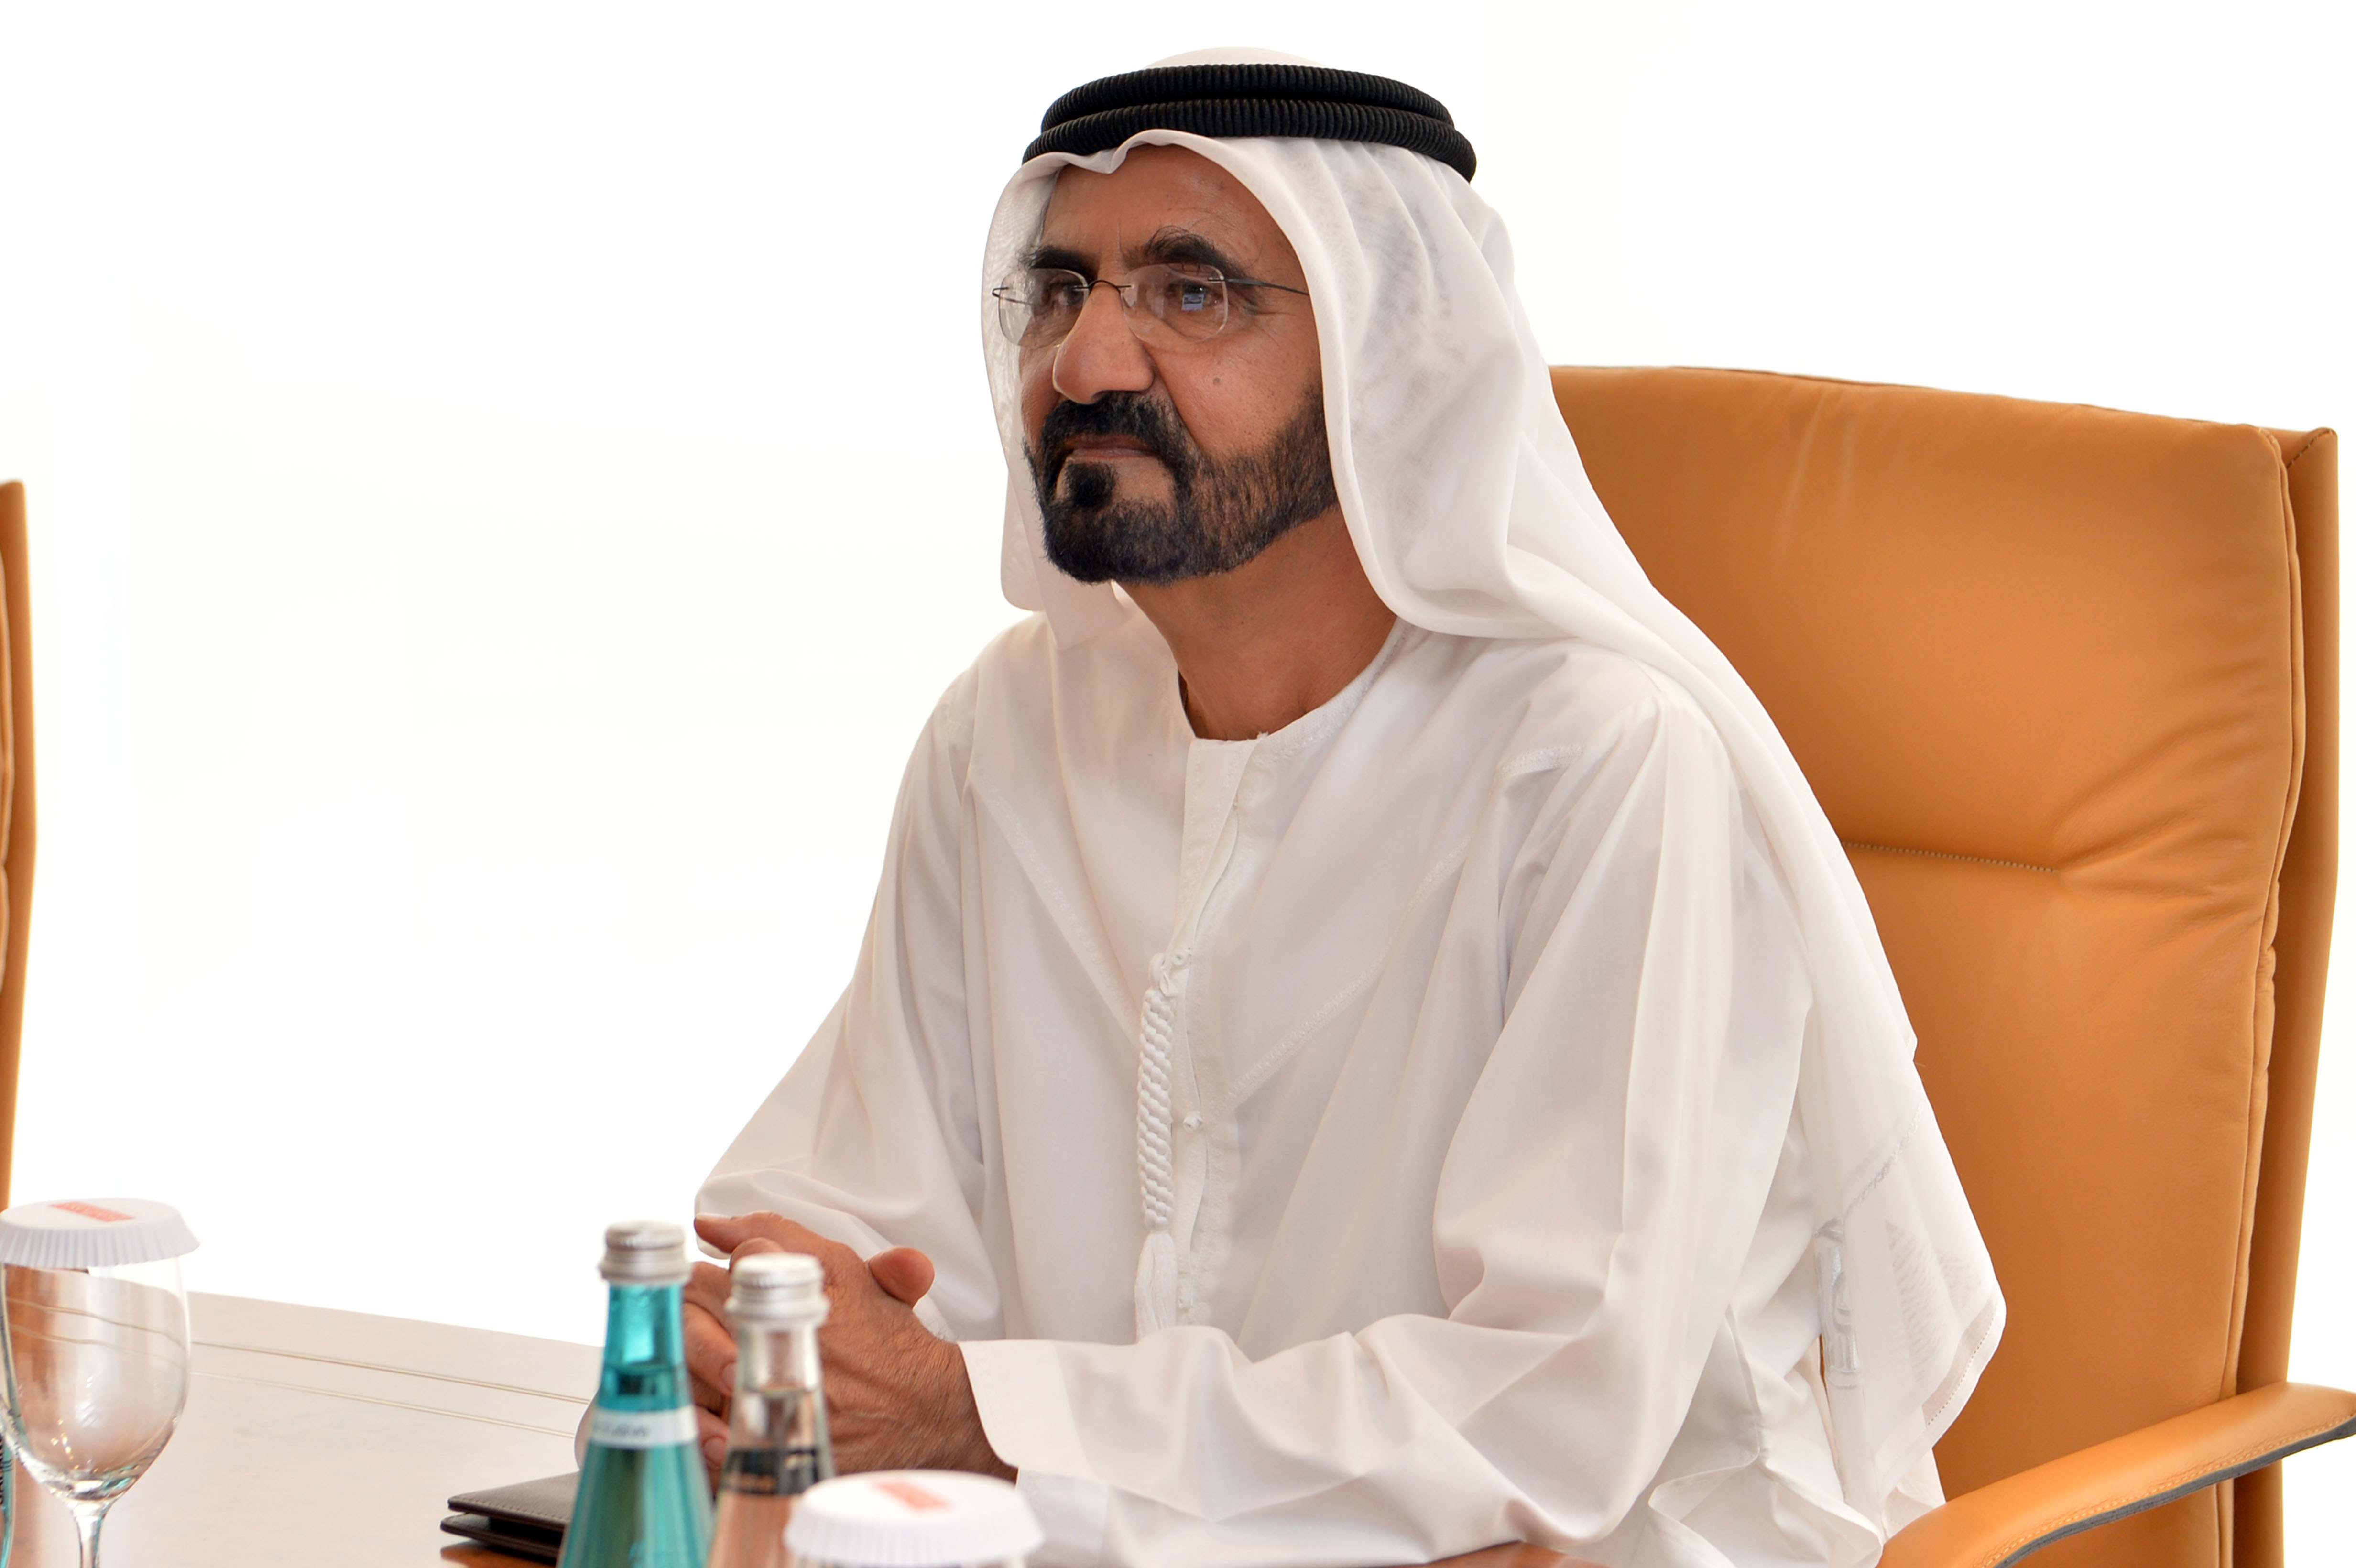 His Highness Sheikh Mohammed bin Rashid Al Maktoum - Mohammed bin Rashid declares 29 October as a day that honours coding and programming professionals